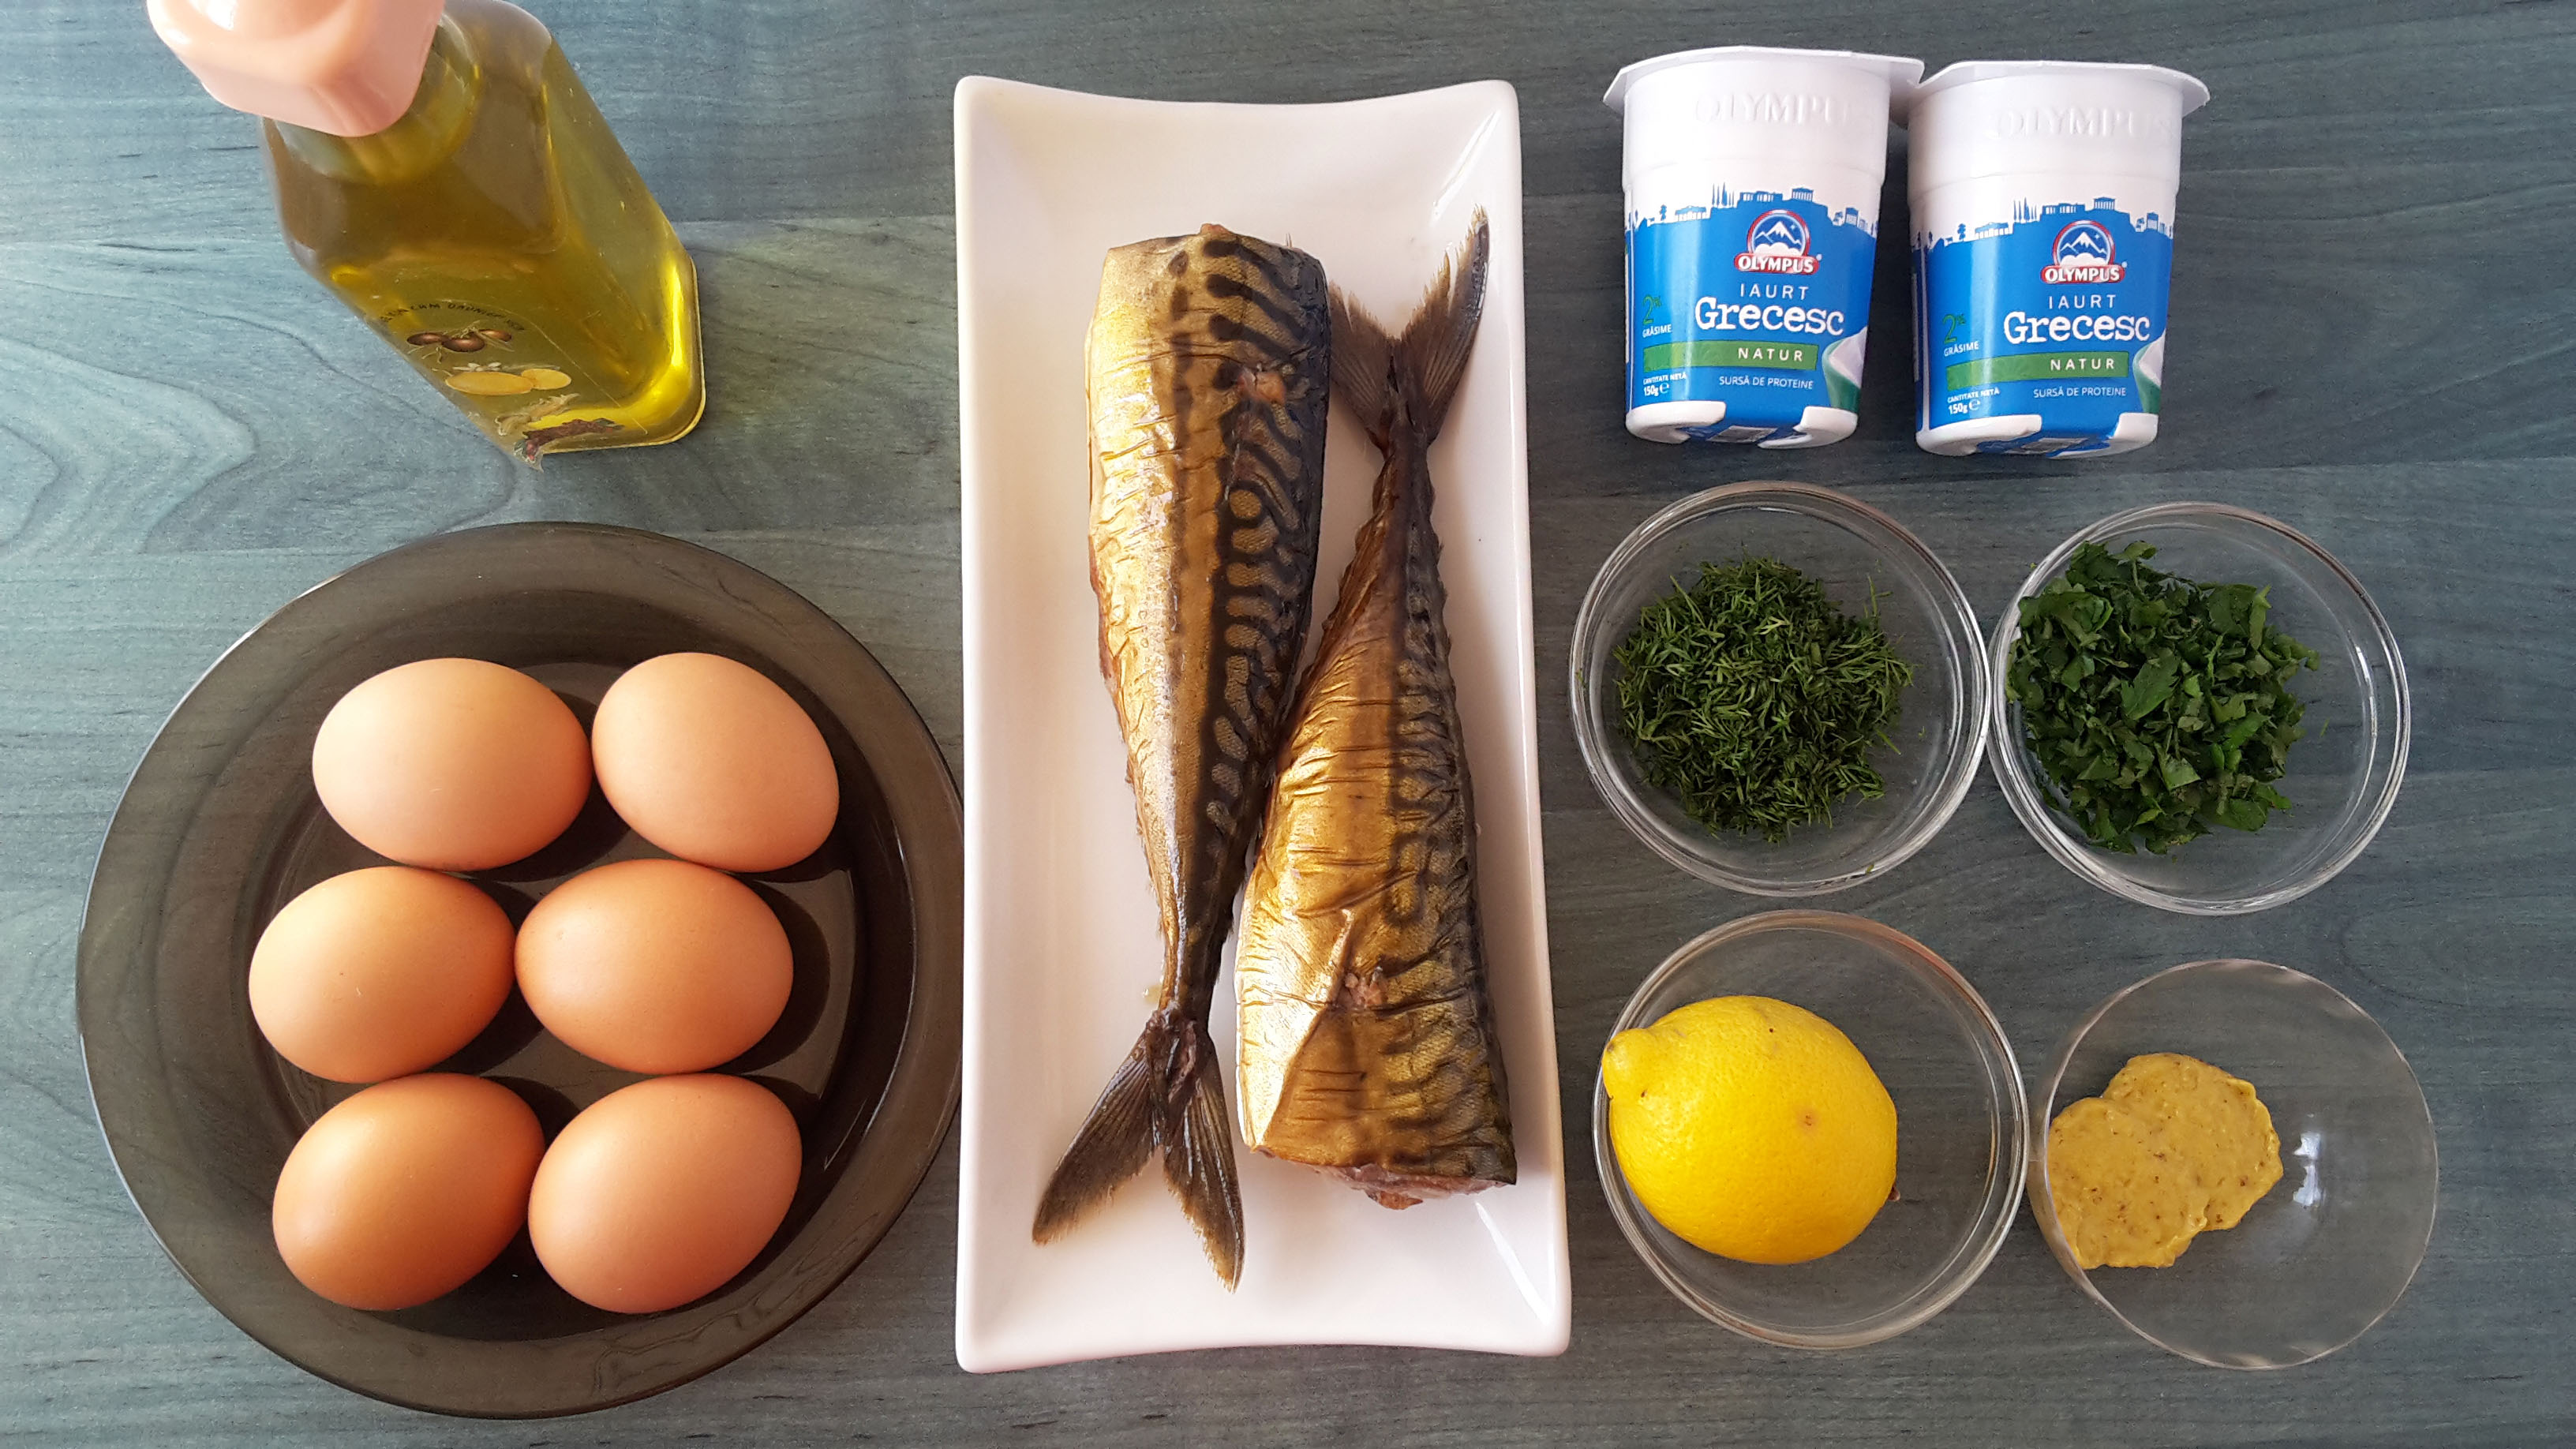 salata cu macrou afumat si iaurt grecesc2 salad with smoked mackerel and greek yogurt